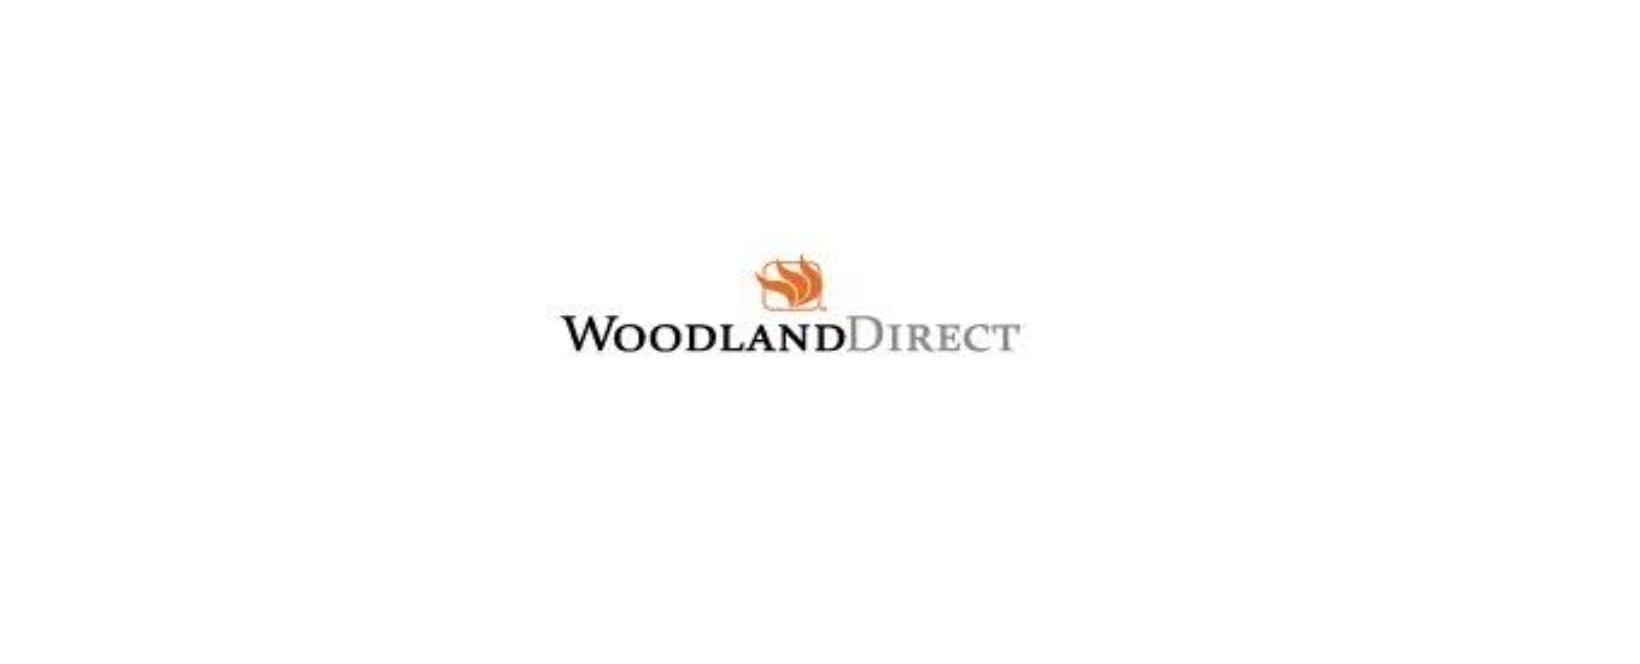 Woodland Direct Discount Code 2021